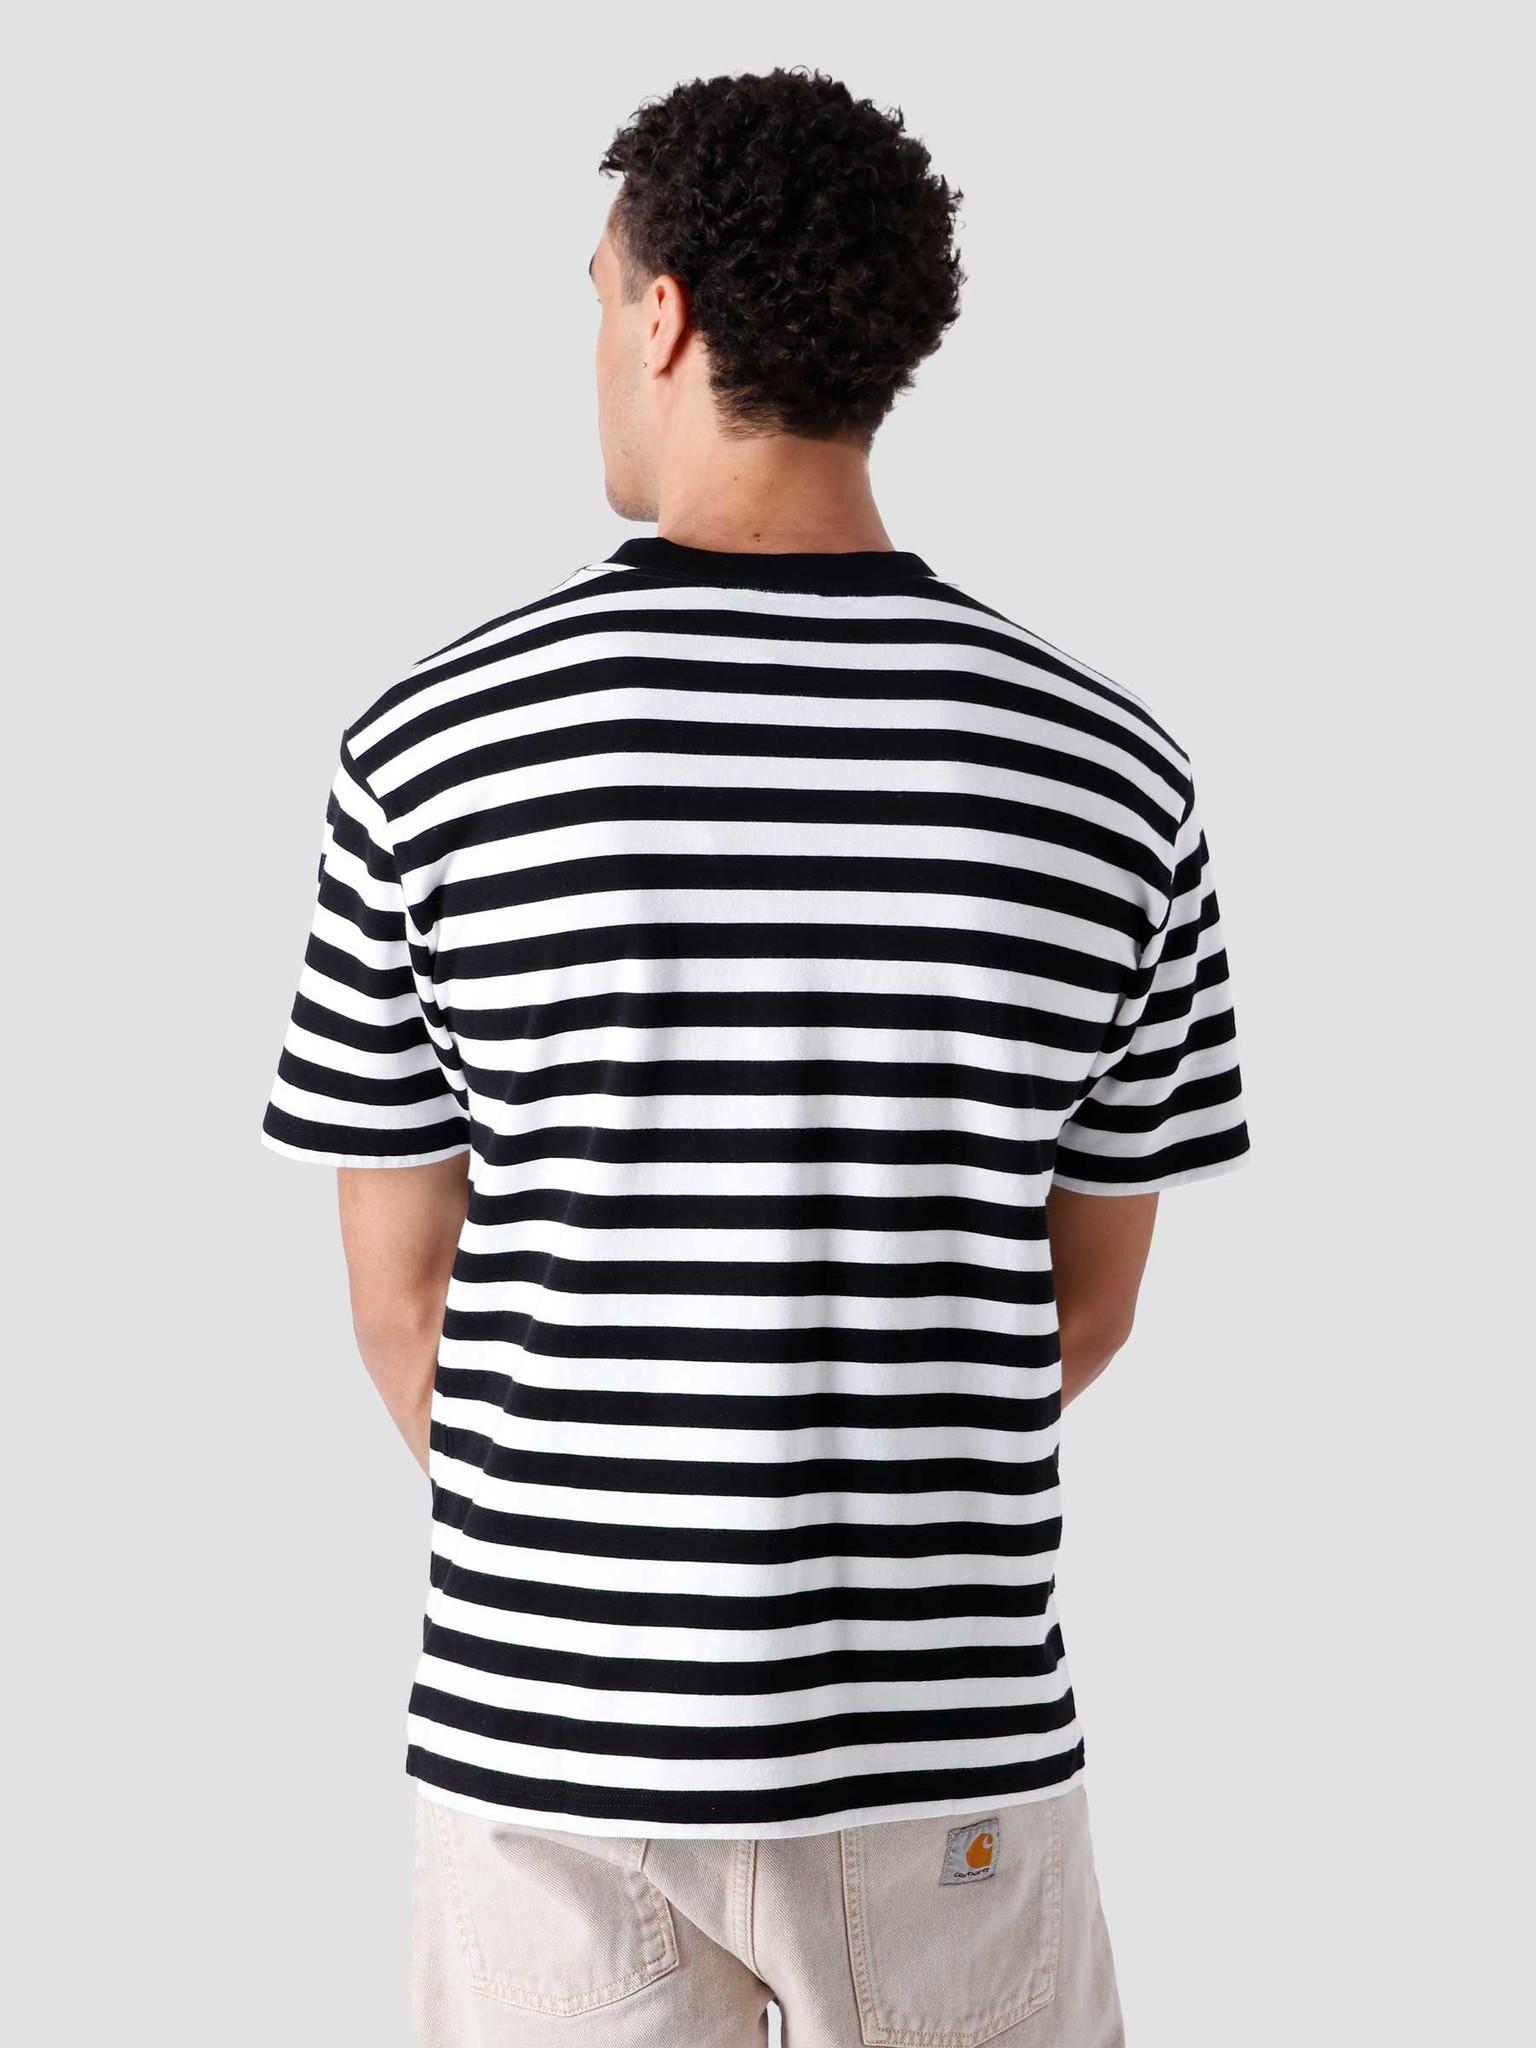 Olaf Hussein Olaf Hussein Stripe Sans T-Shirt White Black